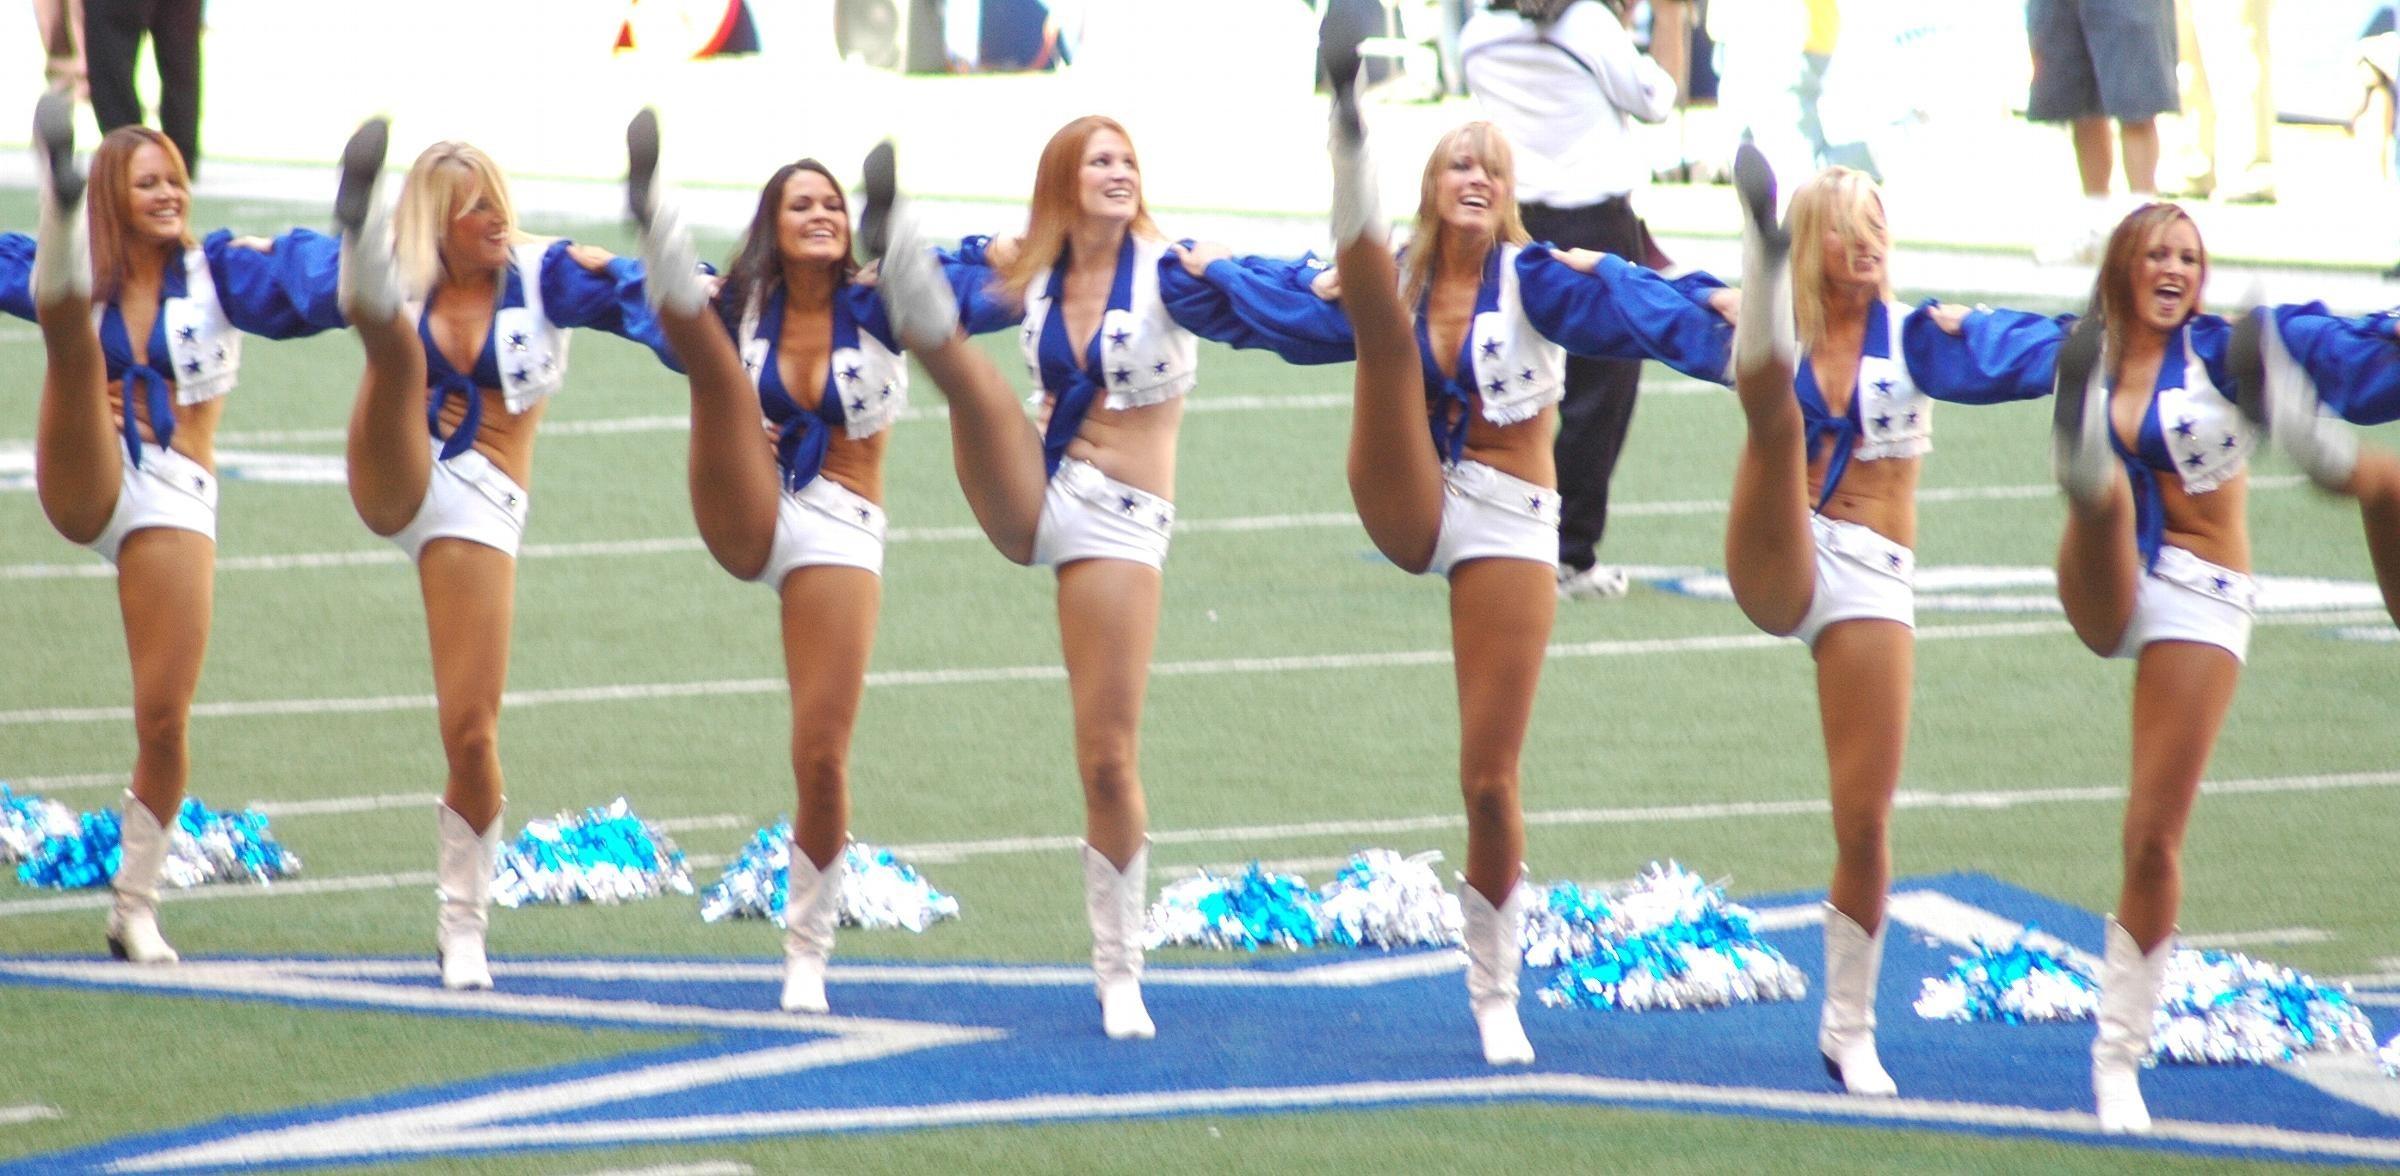 Dallas Cowboys Iphone 7 Wallpaper Cheerleading Wallpapers Desktop 64 Images